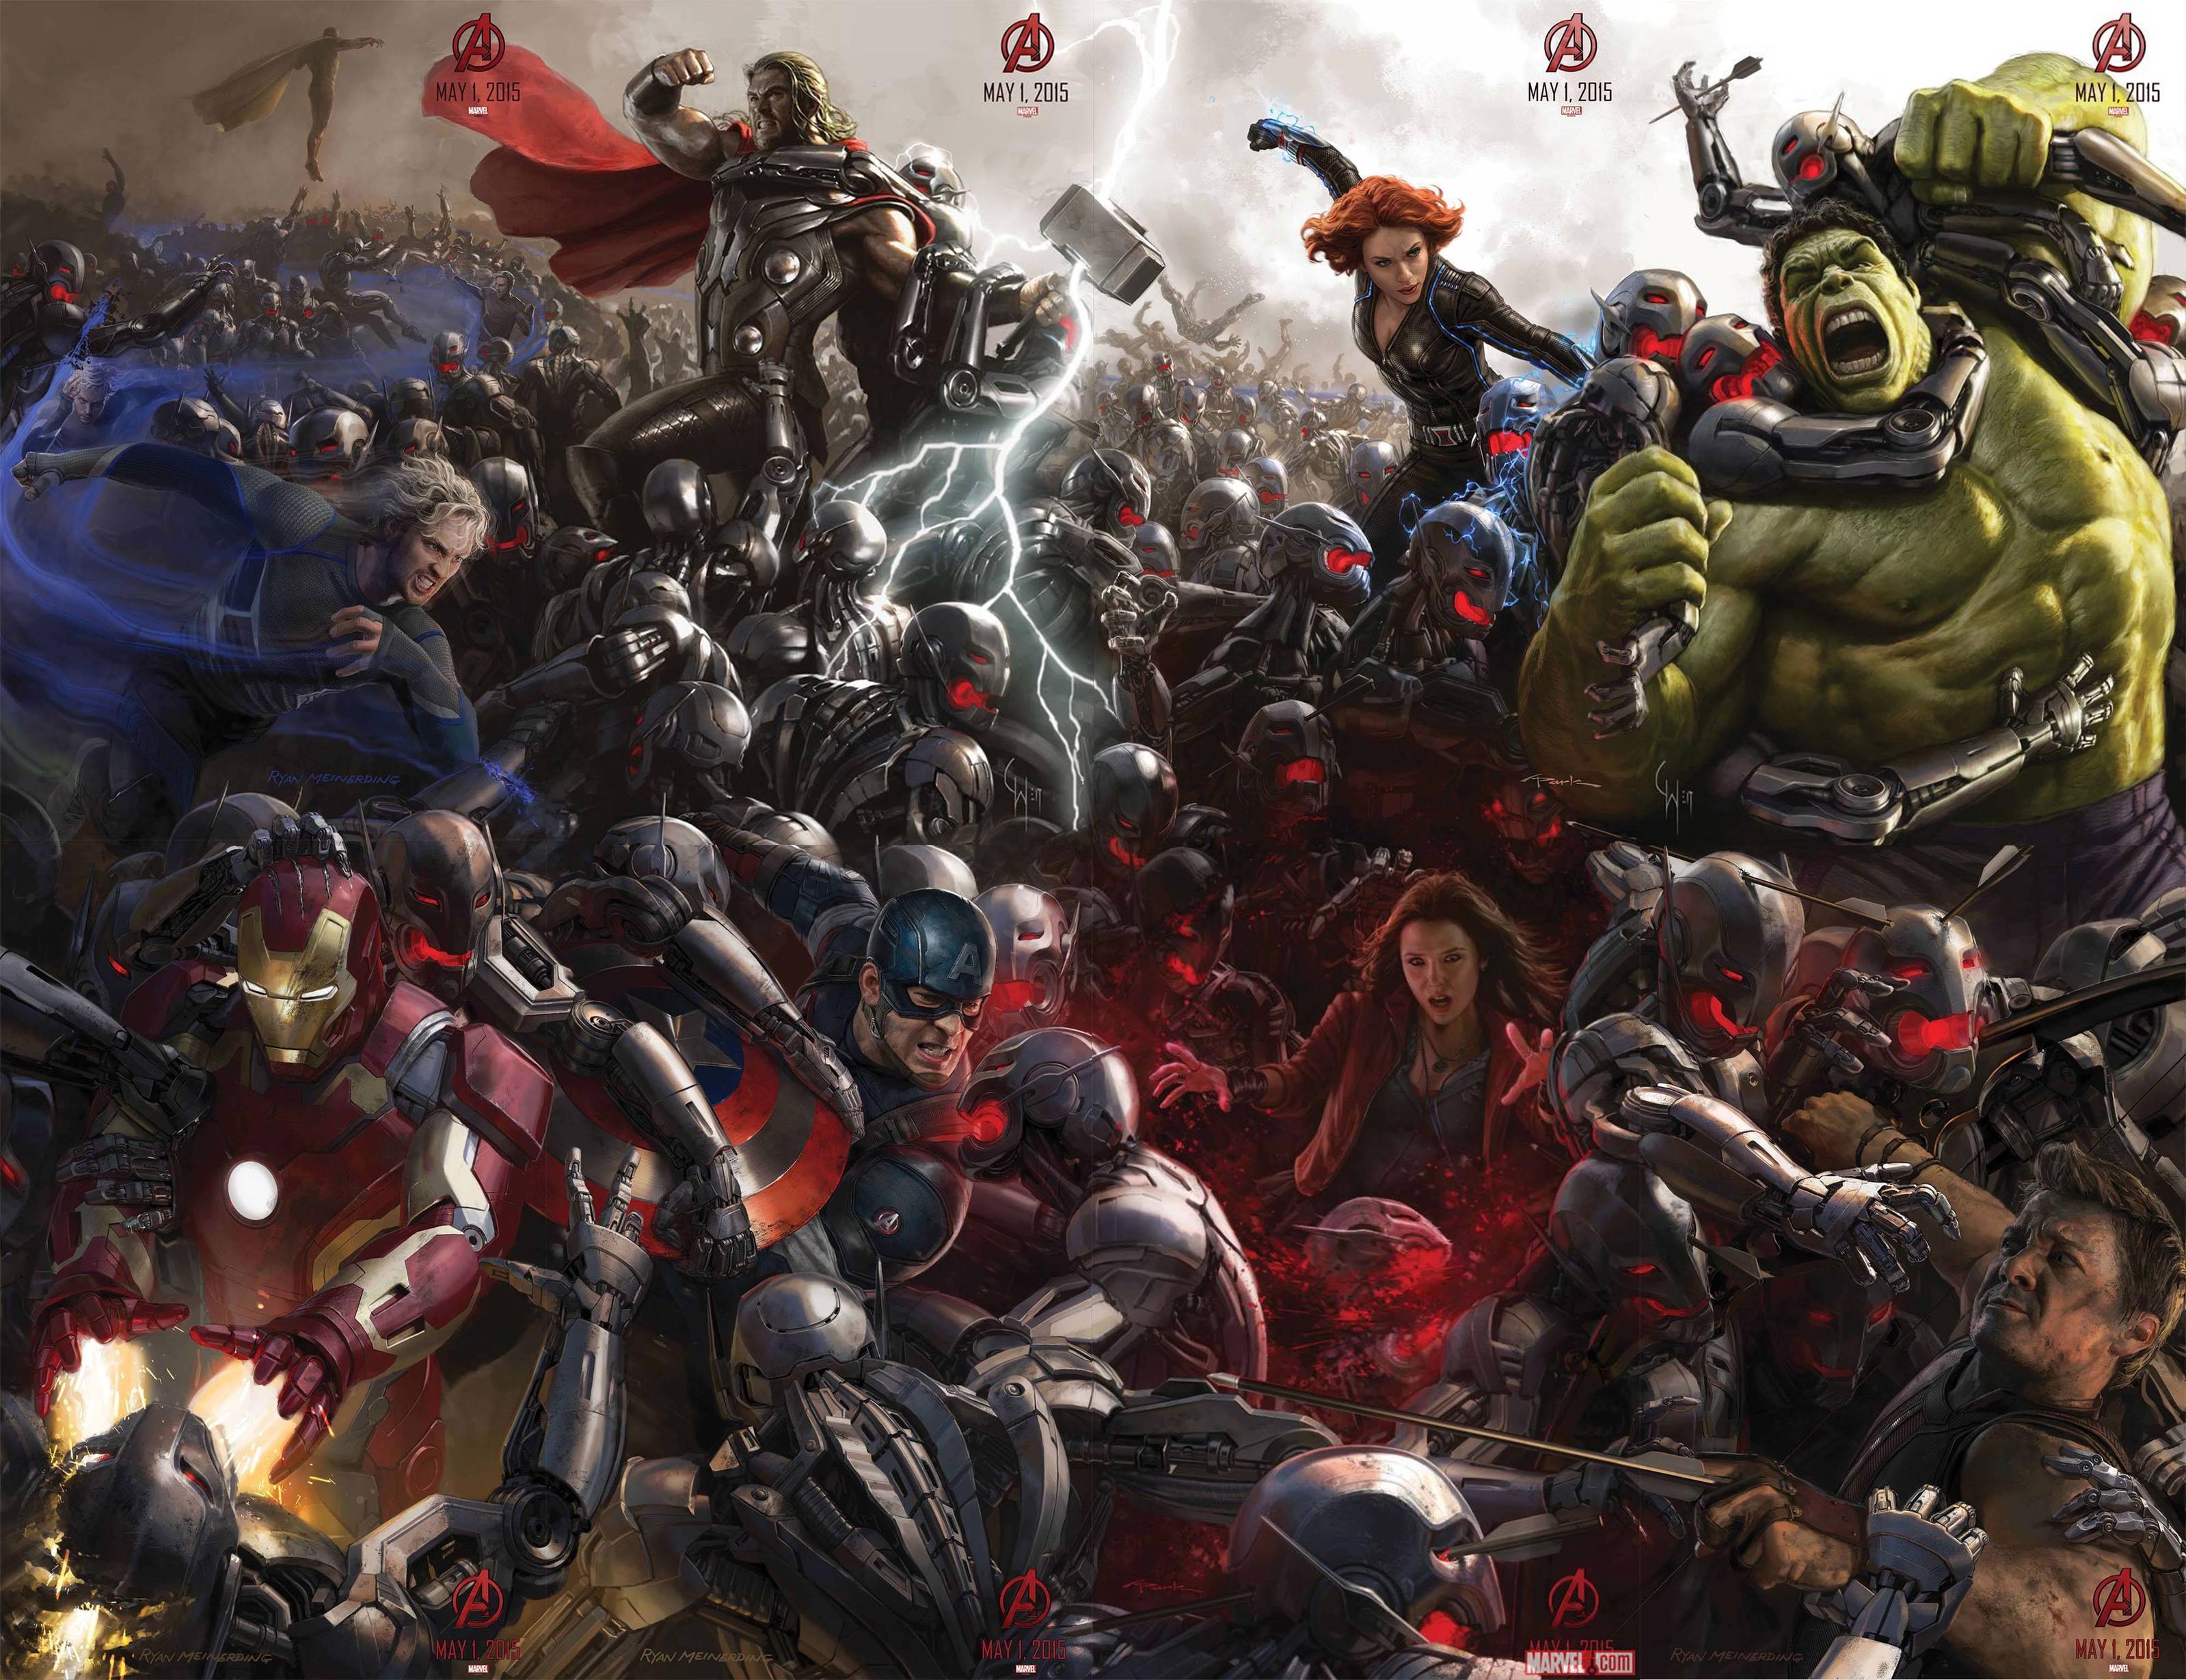 Scarlett Johansson: Avengers, Black Widow, Captain America, Chris Evans, Hawkeye, Hulk, Iron Man, Quicksilver, Robert Downey Jr., Scarlet Witch, Scarlett Johansson, Thor, Дівчата, Avengers: Age of Ultron, Marvel Comics, Tony Stark